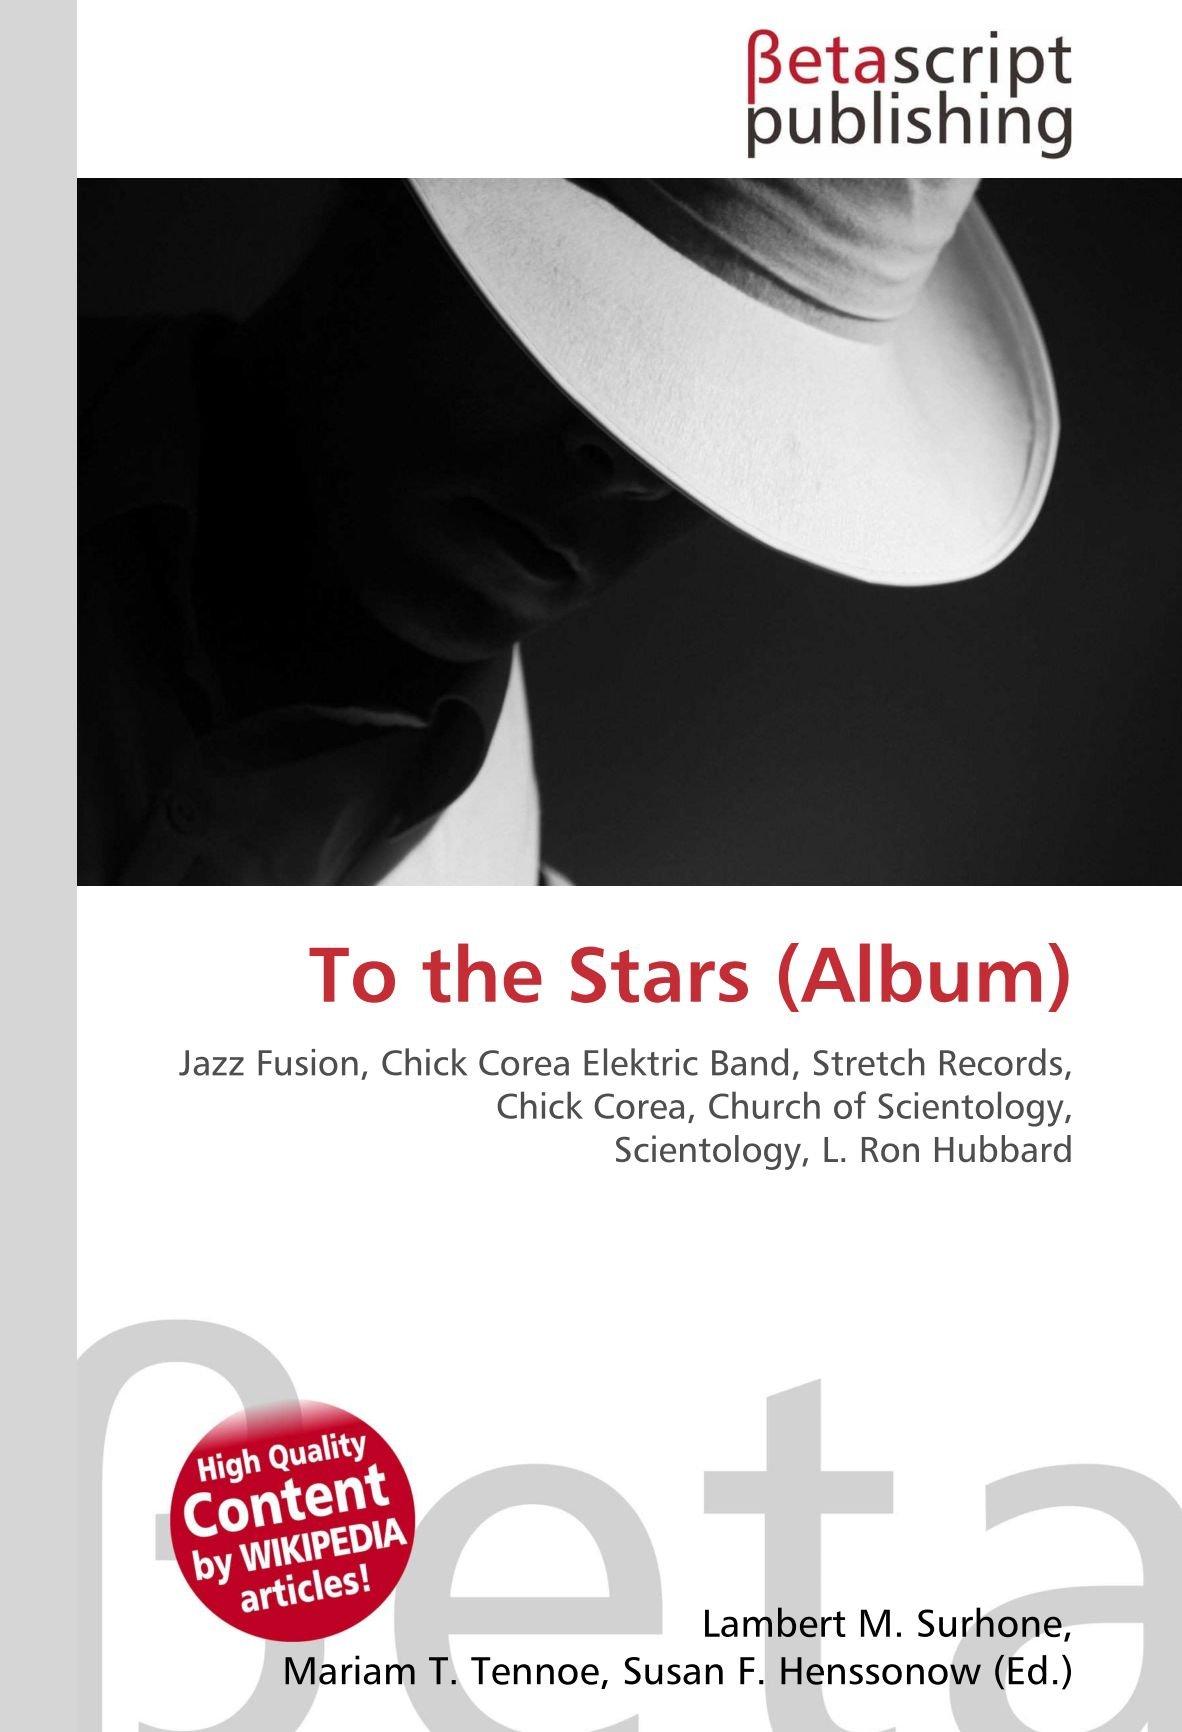 To the Stars Album : Jazz Fusion, Chick Corea Elektric Band ...